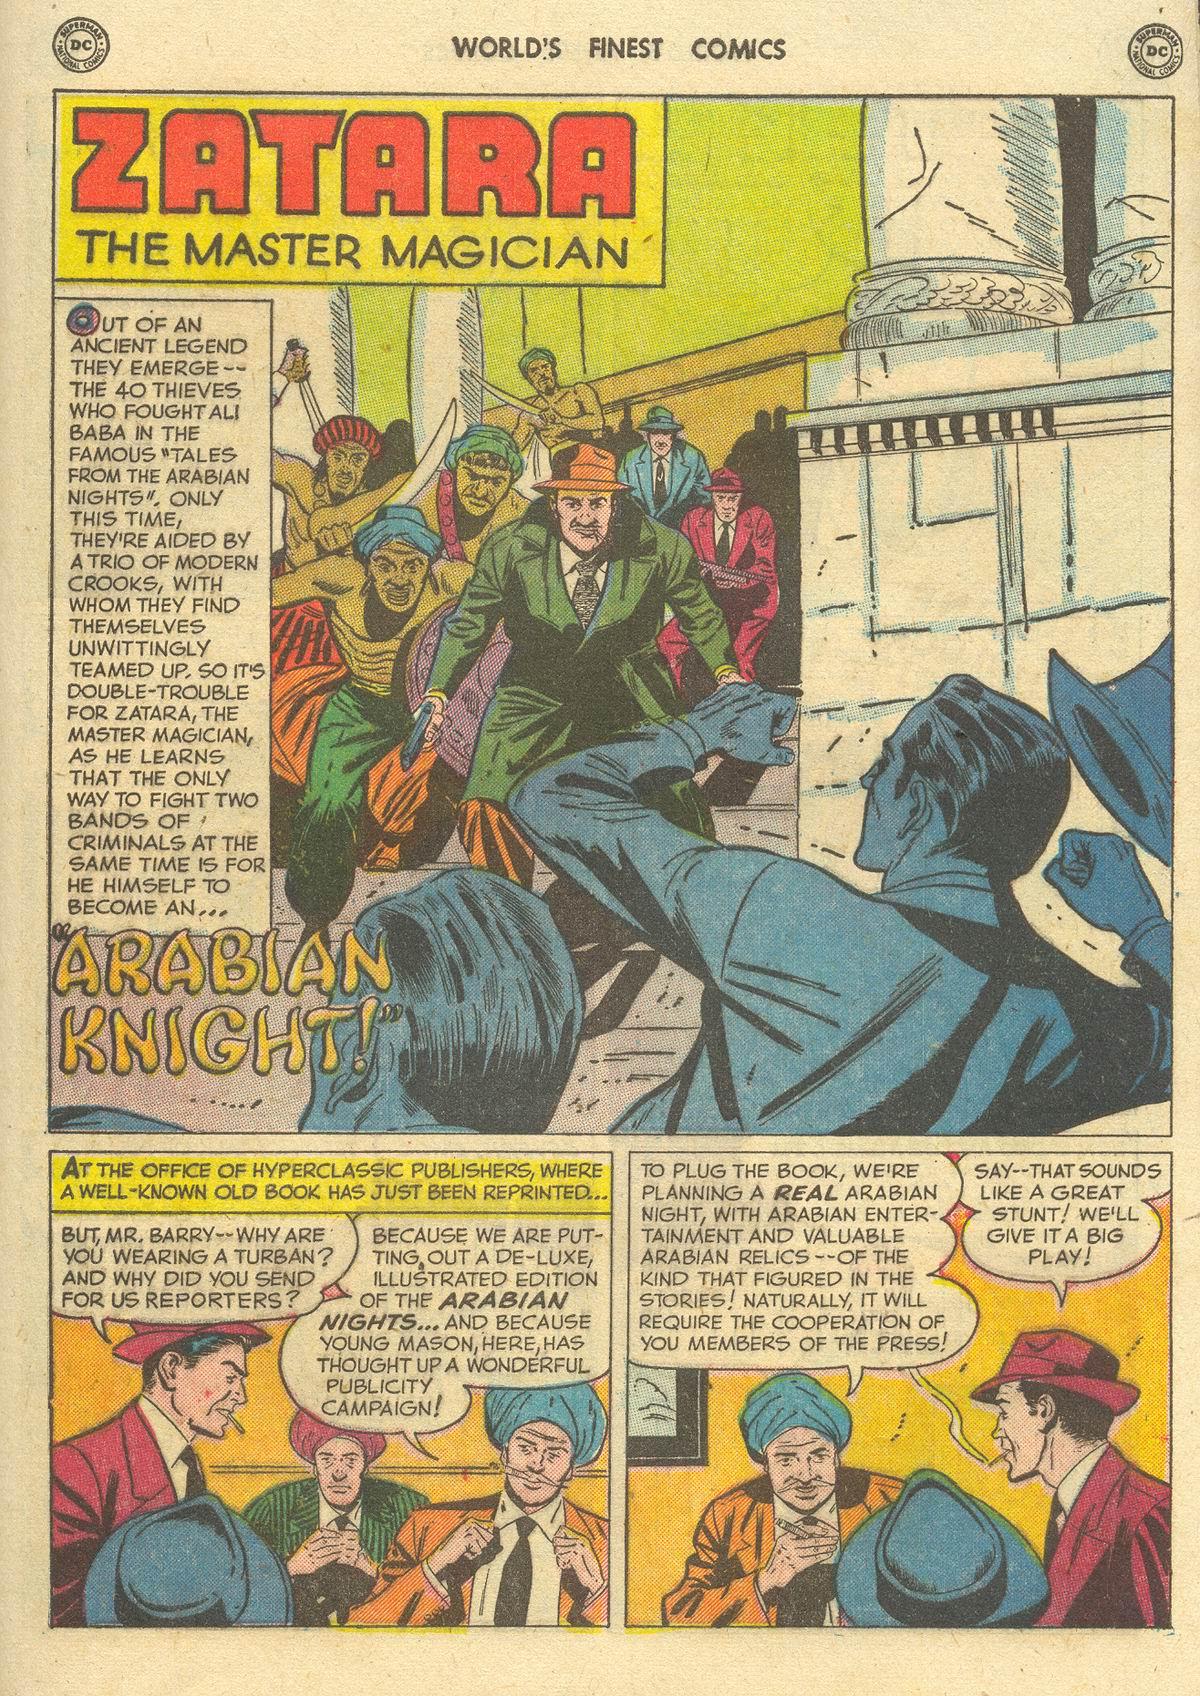 Read online World's Finest Comics comic -  Issue #51 - 55